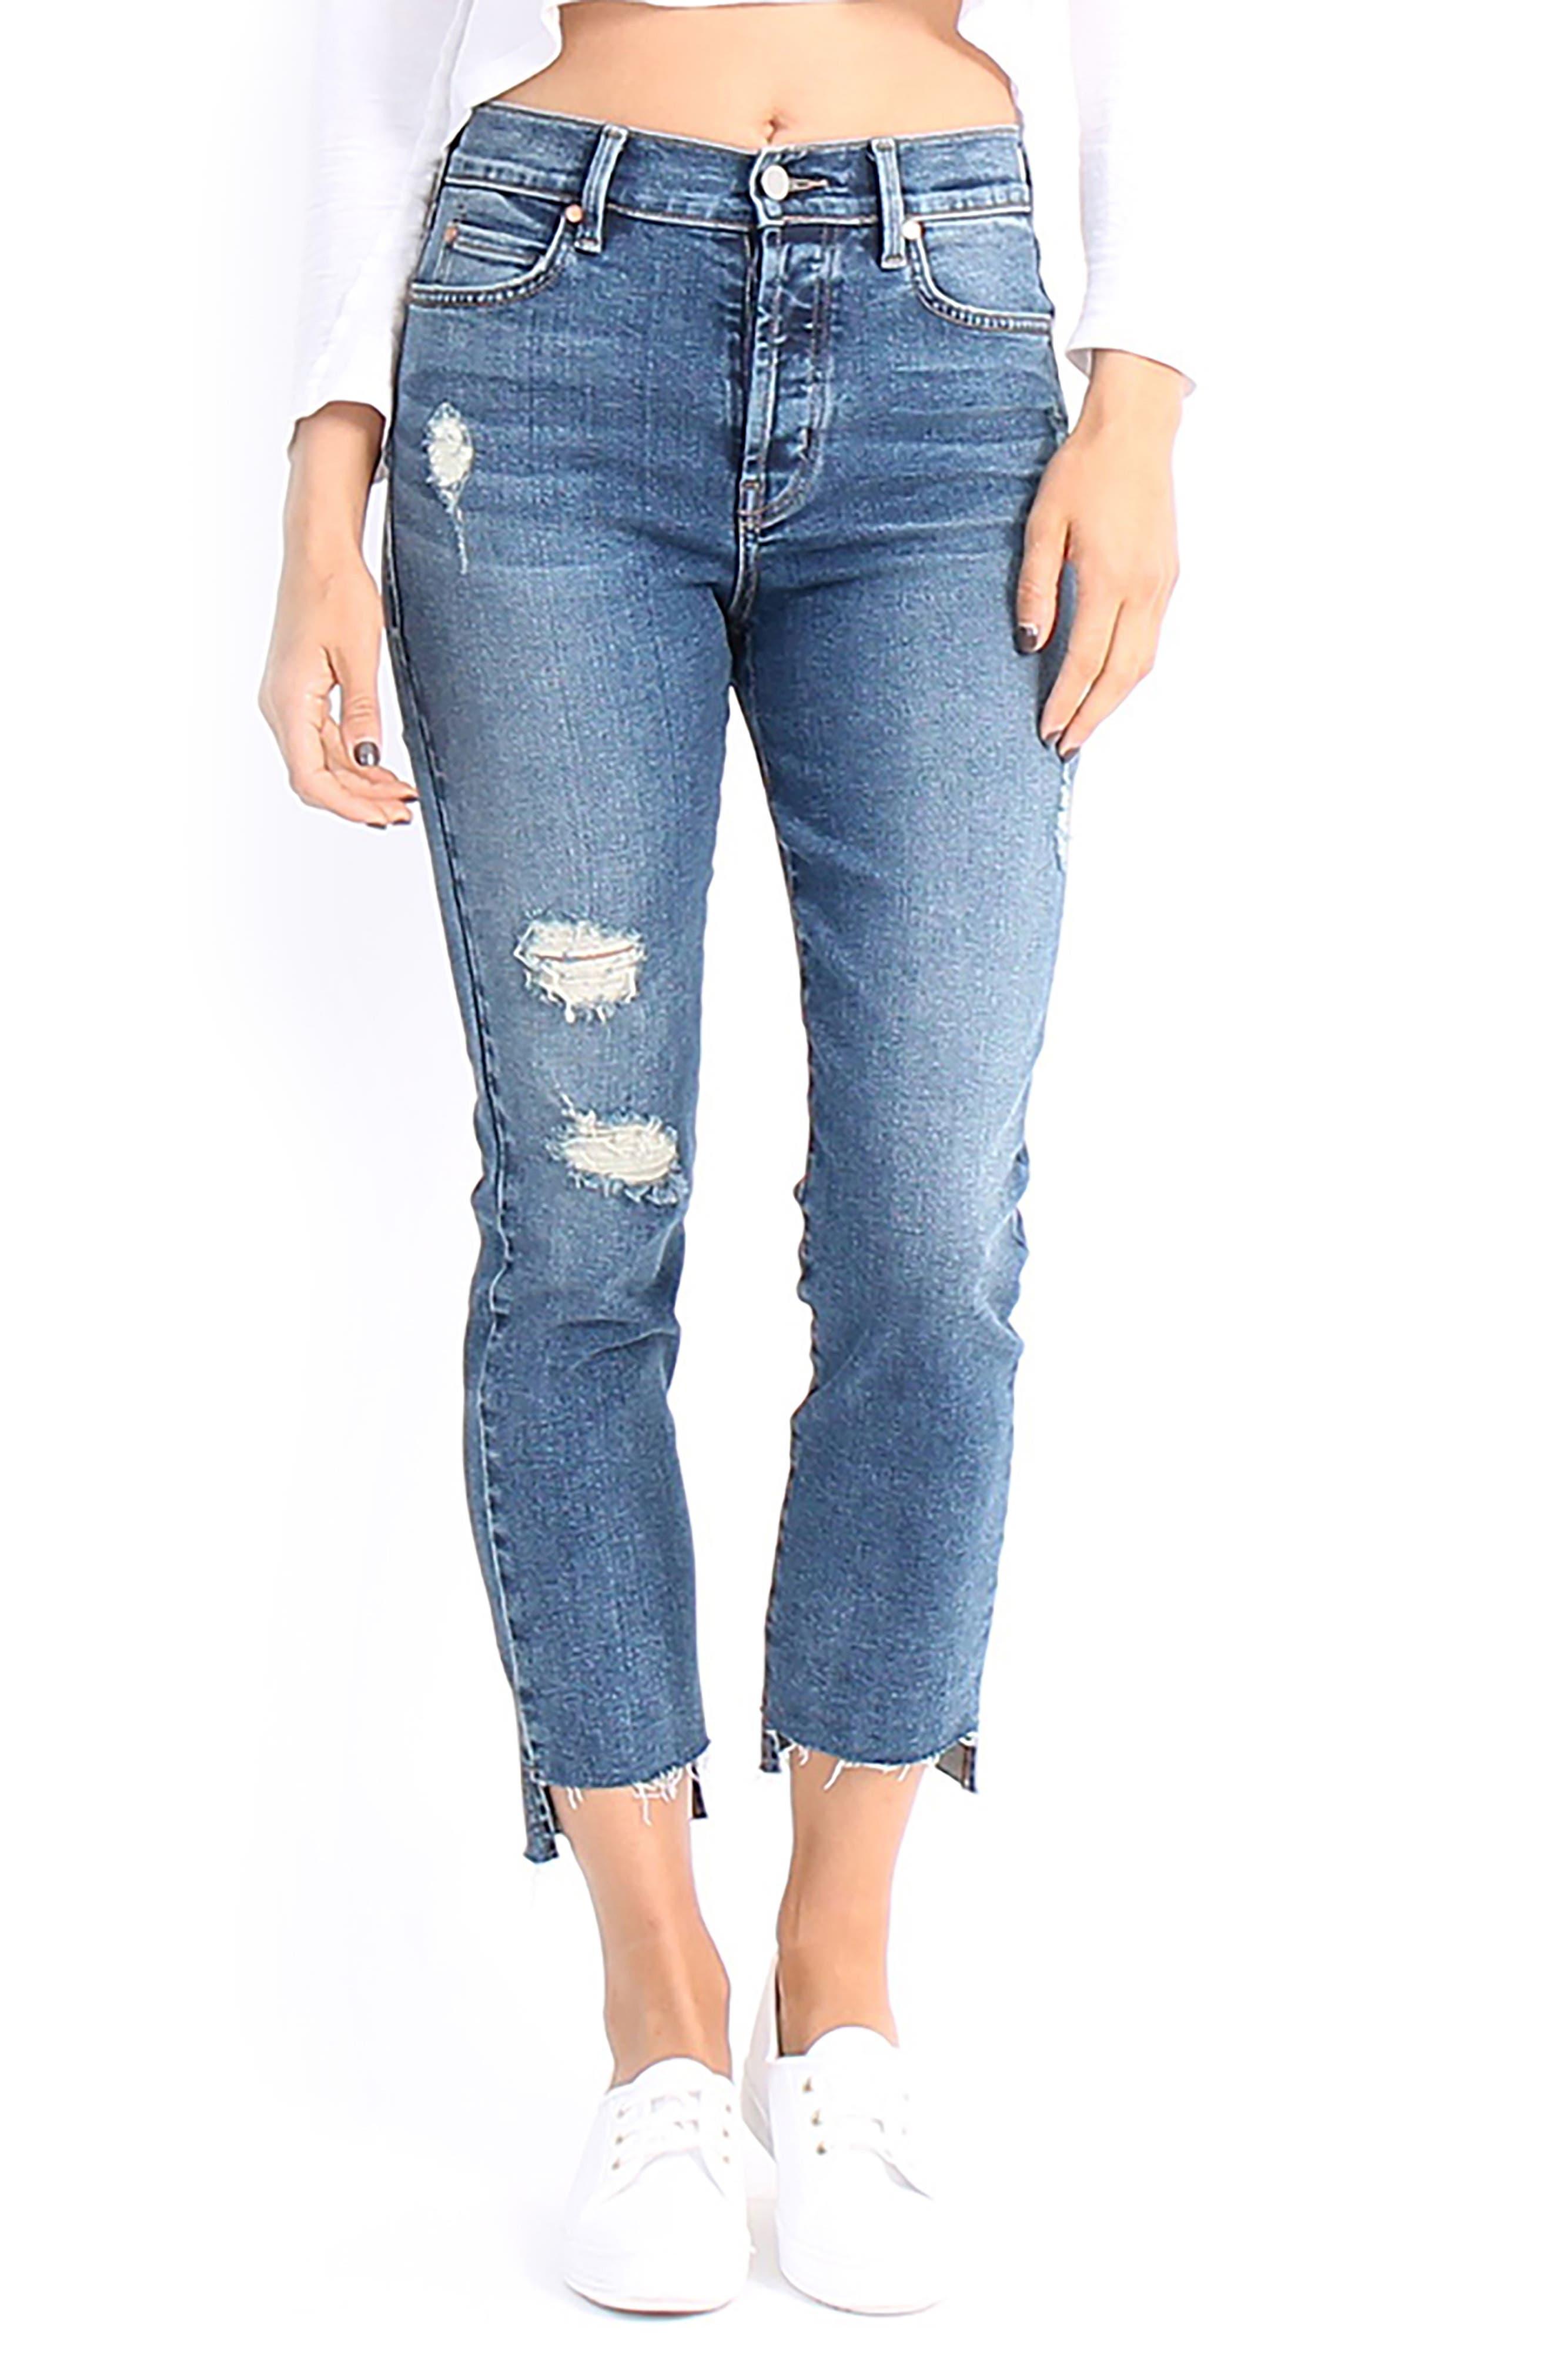 Skylar High-Waist Step Hem Distressed Jeans,                         Main,                         color, Allure